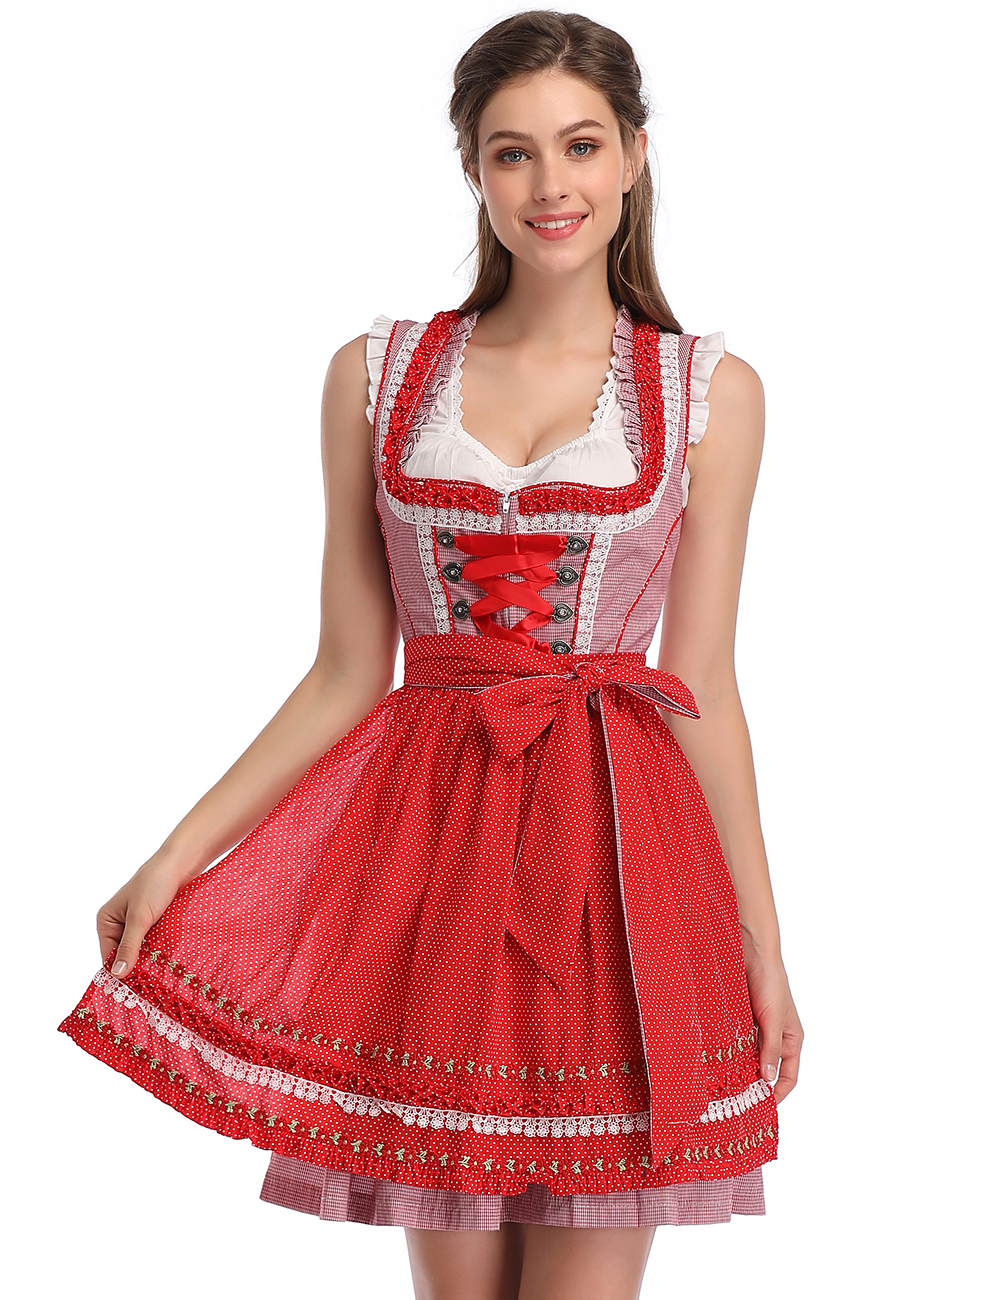 KOJOOIN Women's German Dirndl Dress Costumes Set for Bavarian Oktoberfest Halloween Carnival